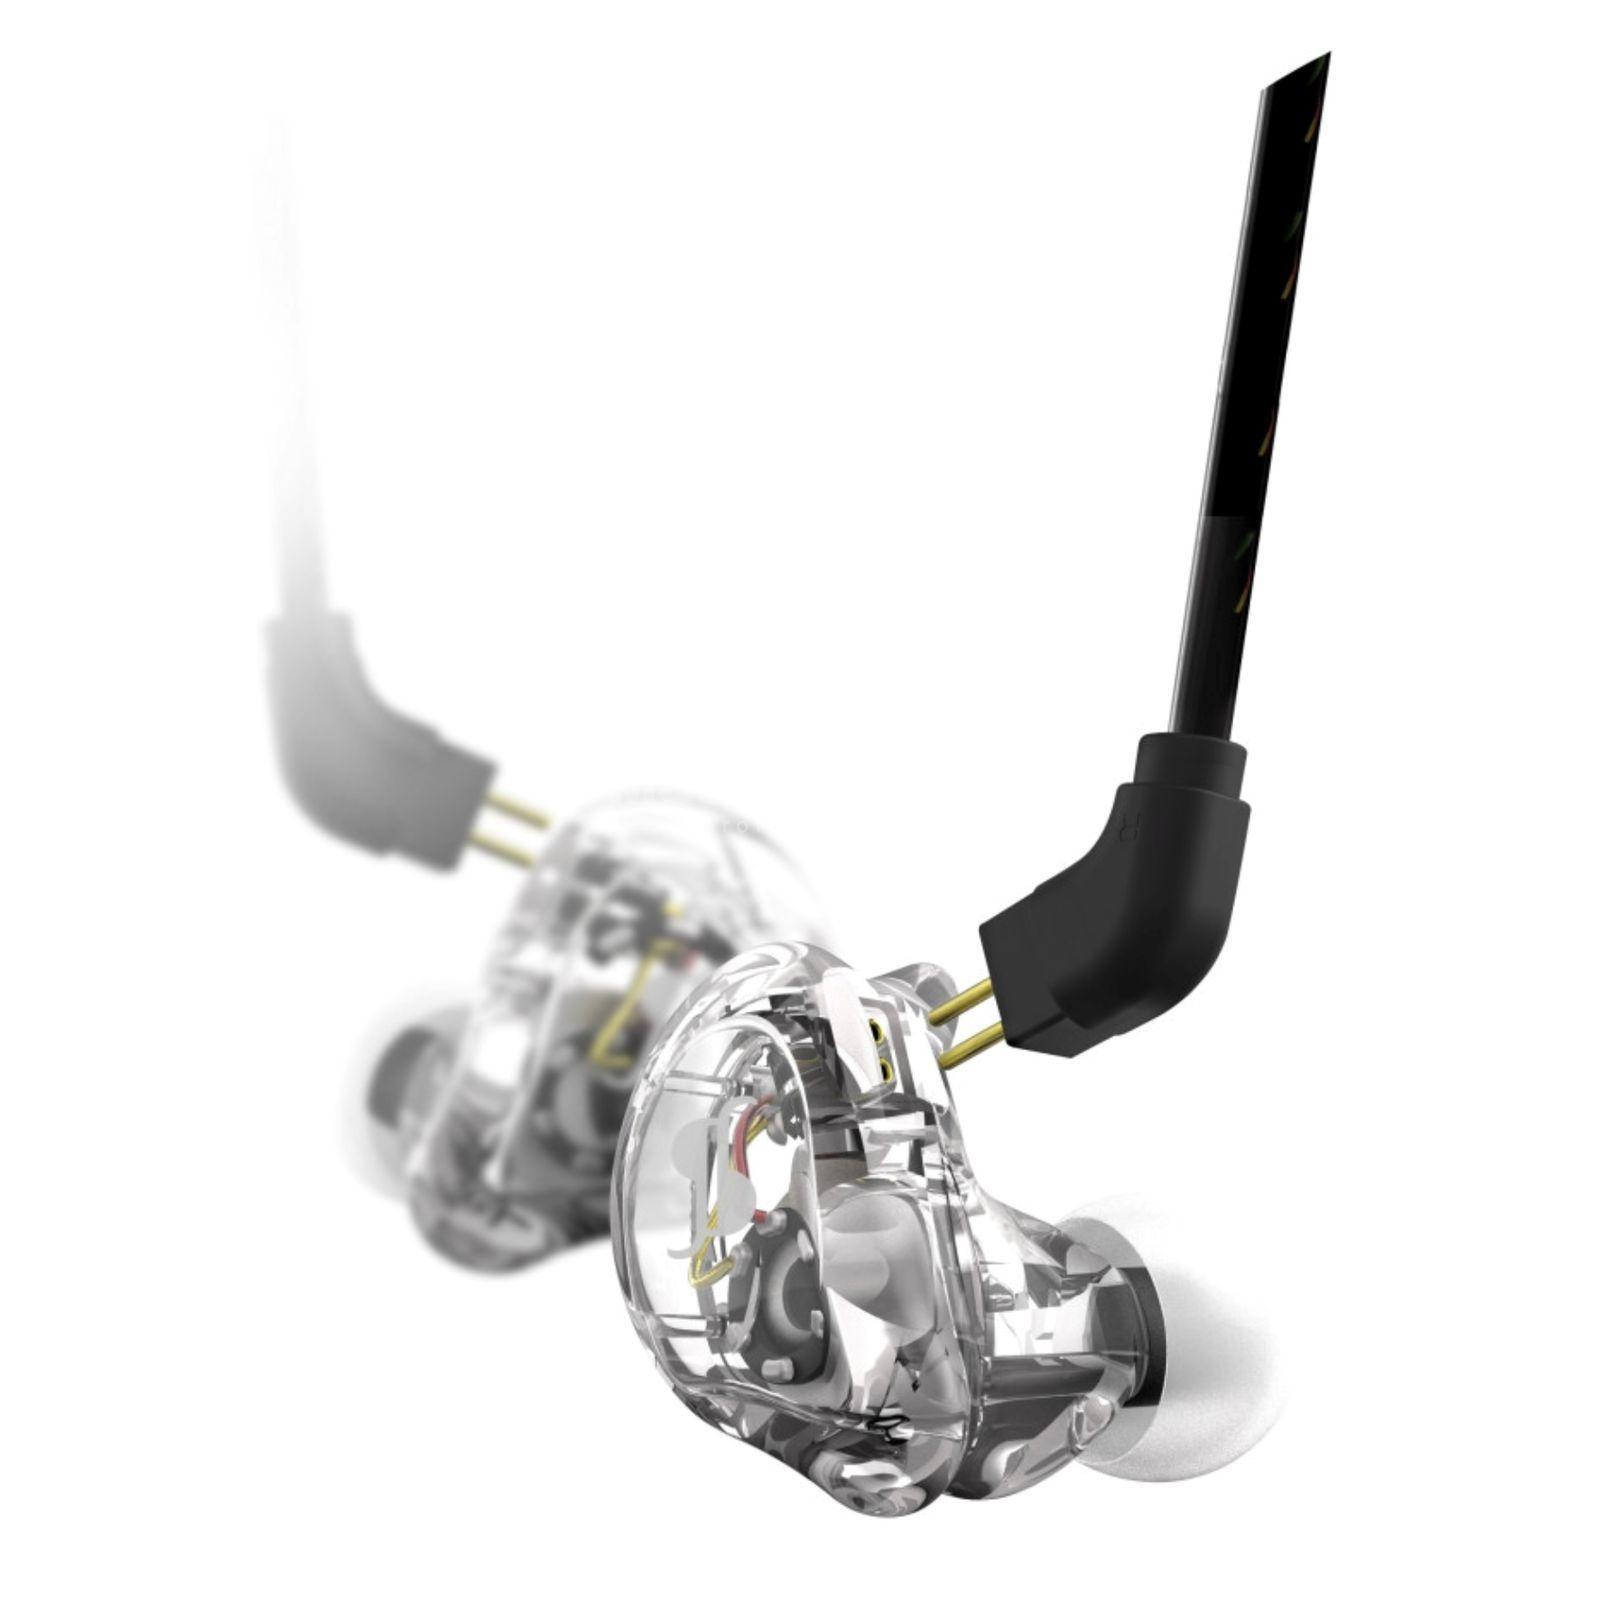 stagg Stagg SPM 235 TR In-Ear-Hörer